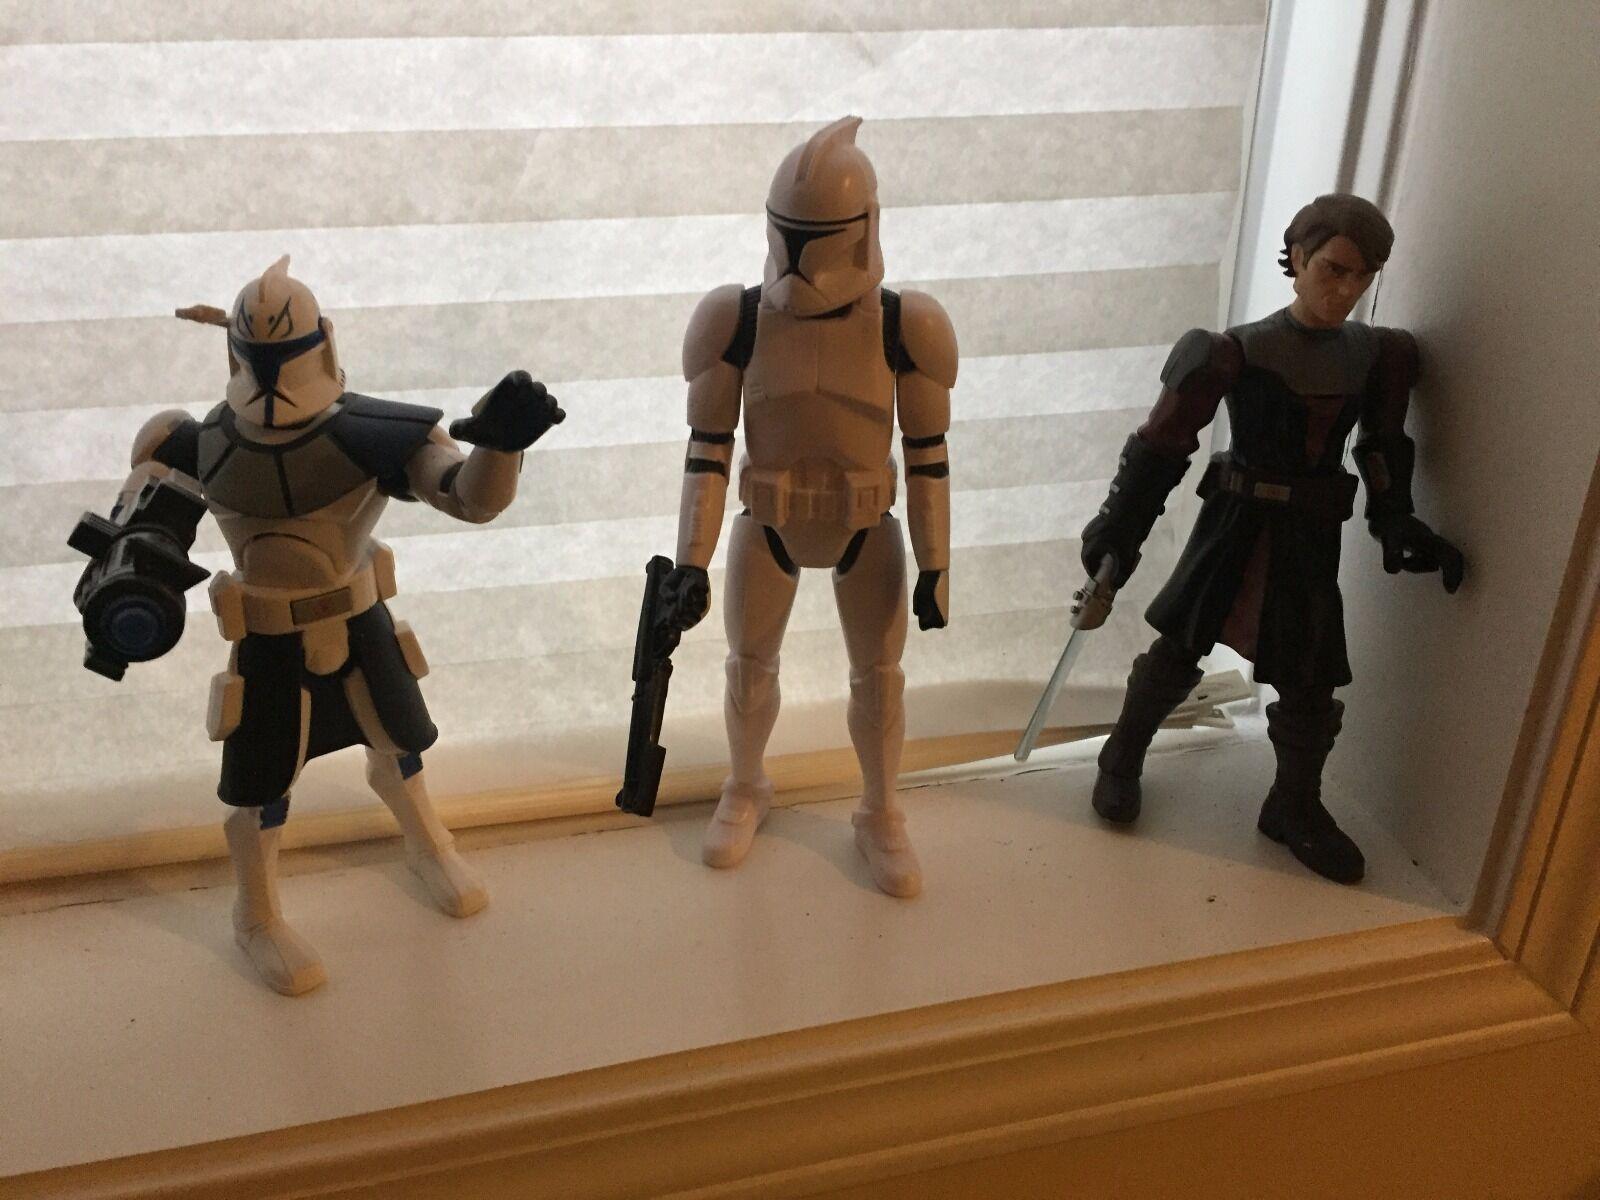 Star Wars Figures - Large - Anakin Skywalker and 2 Clone Troopers